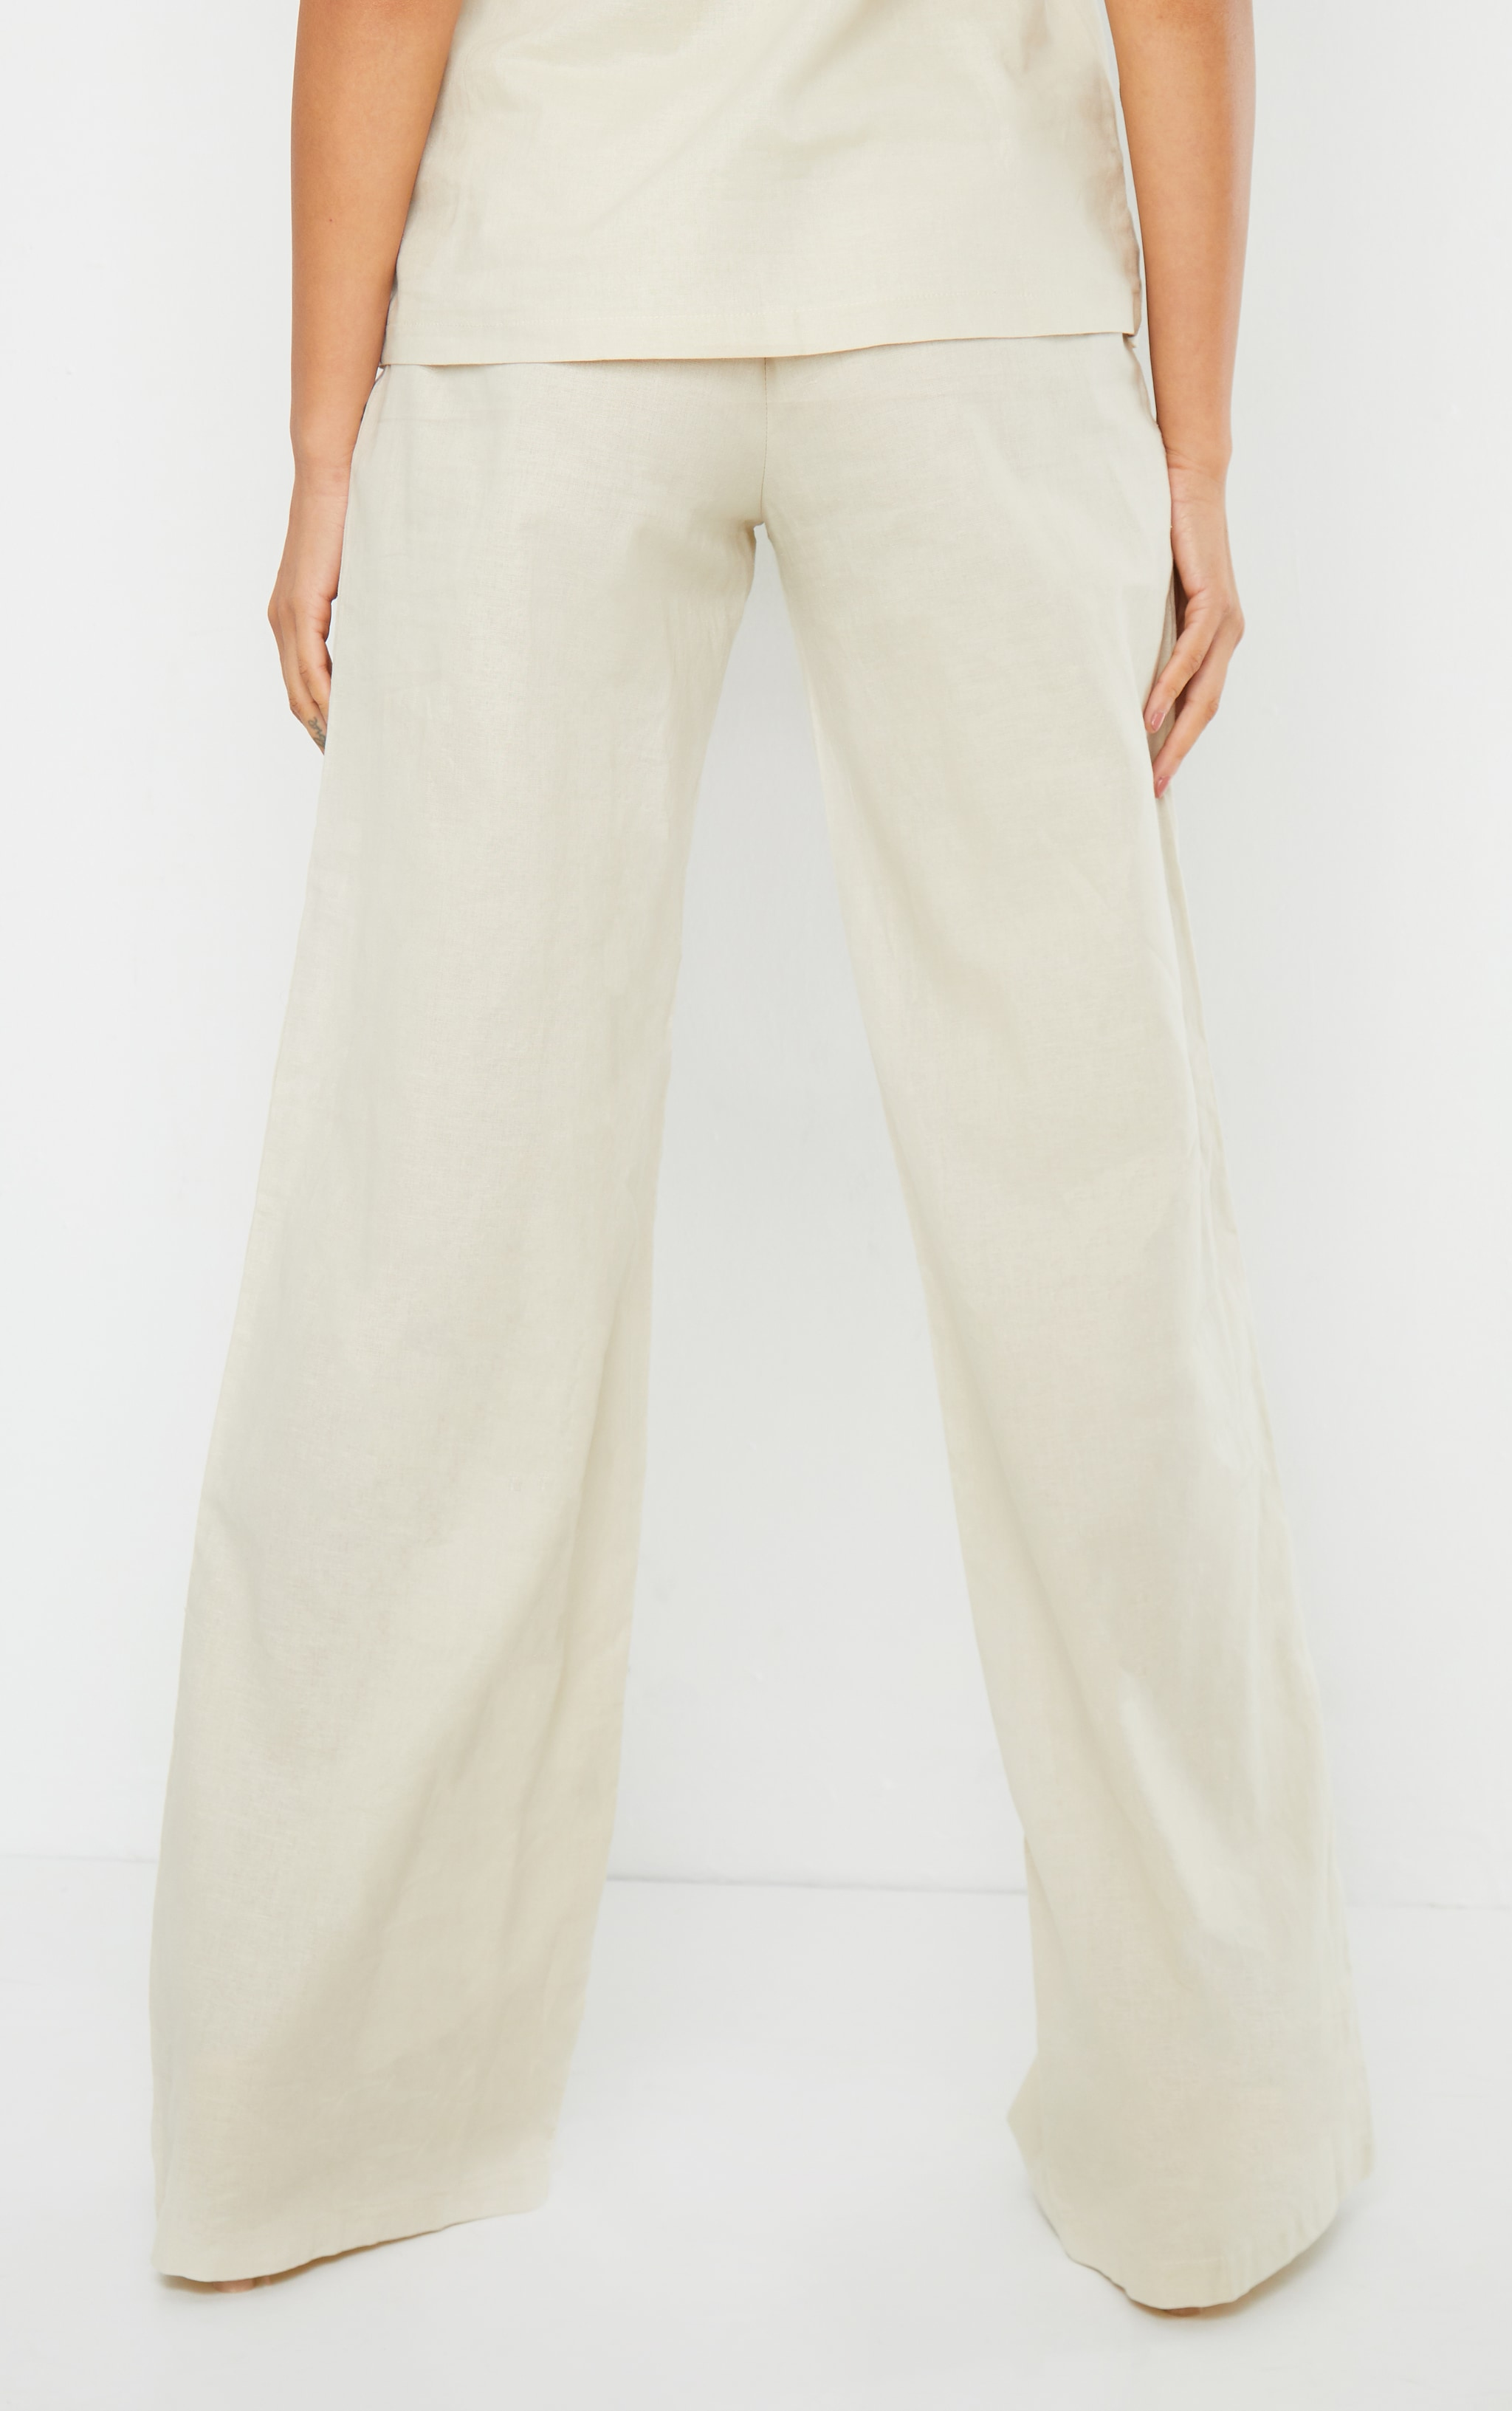 Cream Woven High Waisted Wide Leg Pant 3